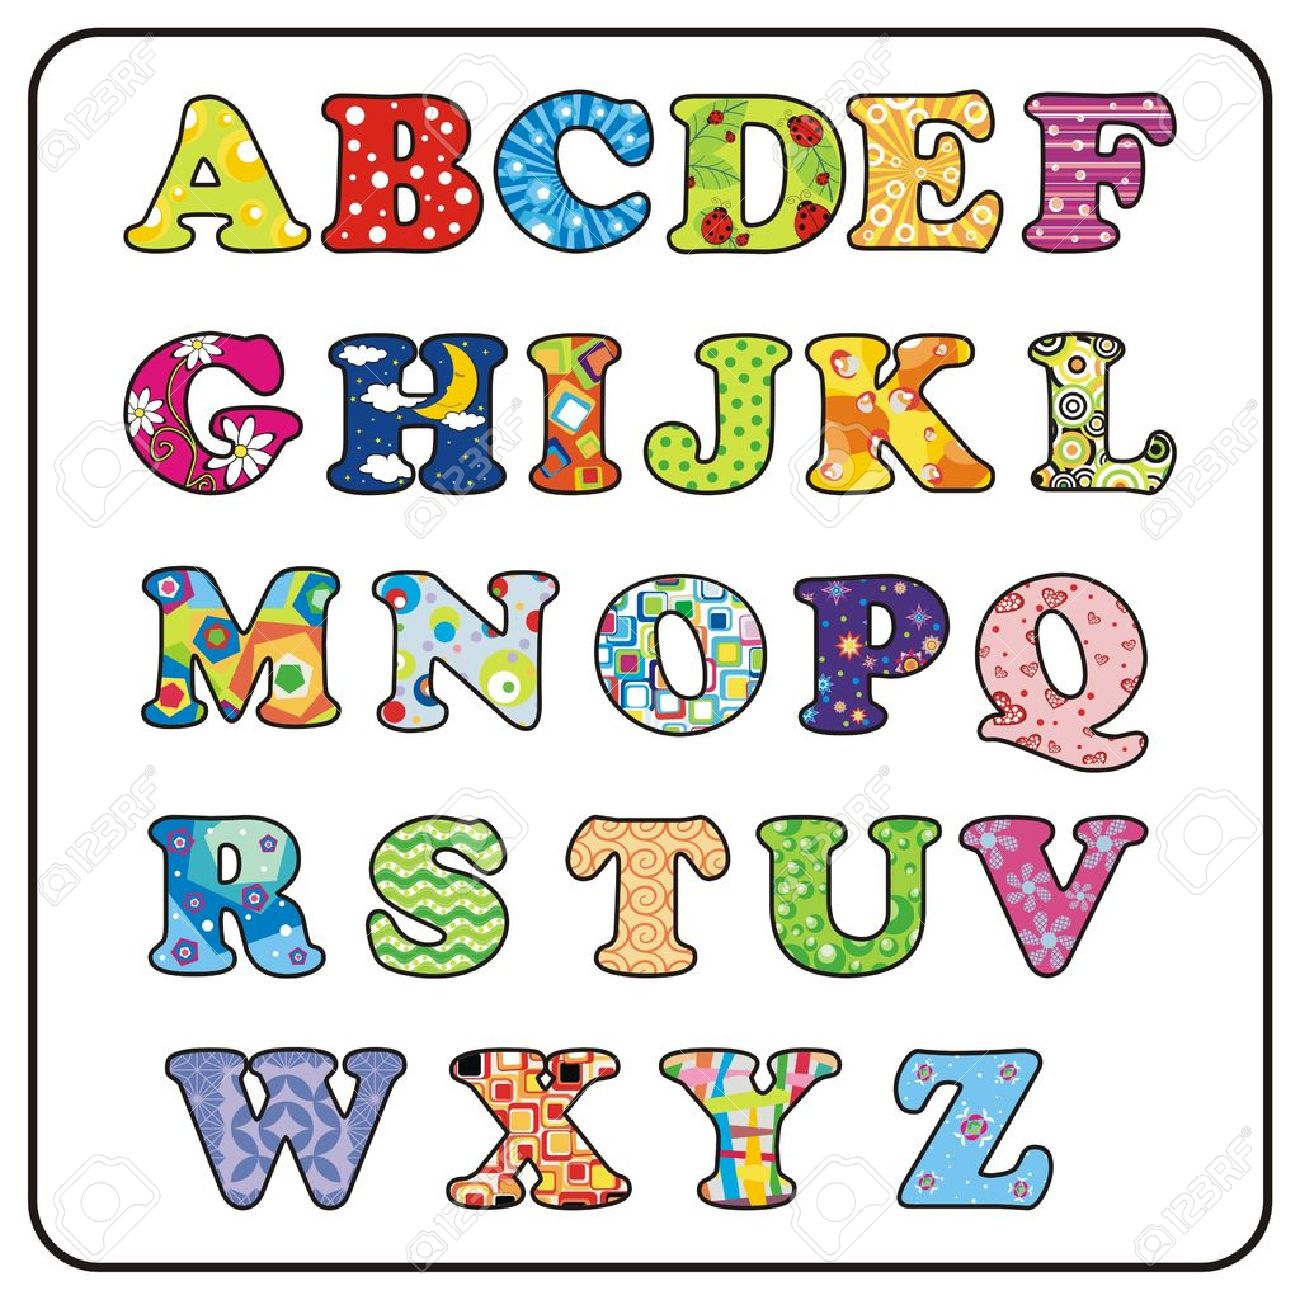 Colorful Alphabet Stock Vector - 21824562